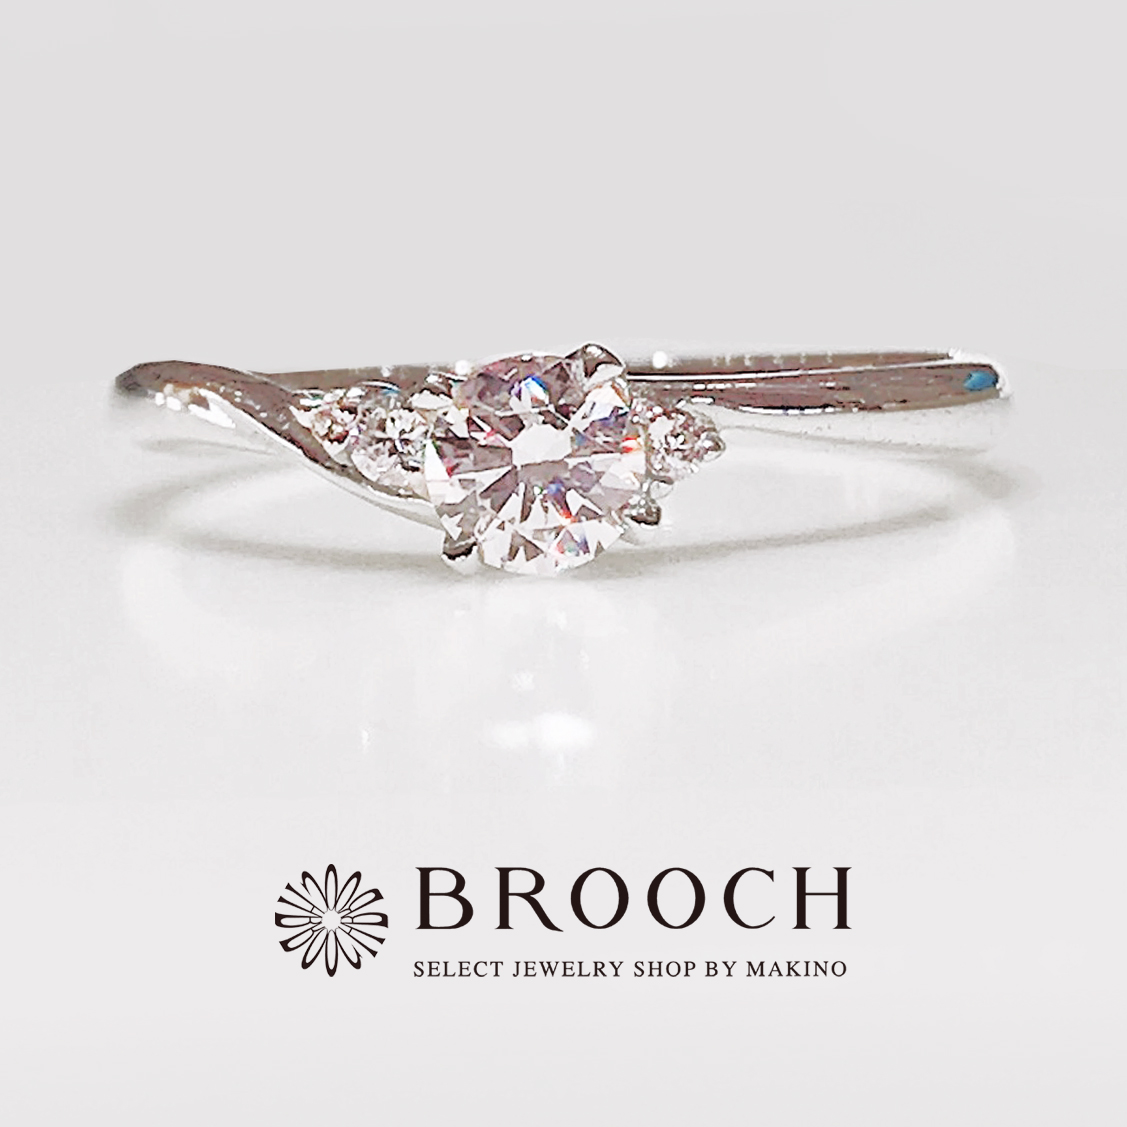 BROOCH 婚約指輪 エンゲージリング 4点留め両サイドダイヤウエーブデザイン